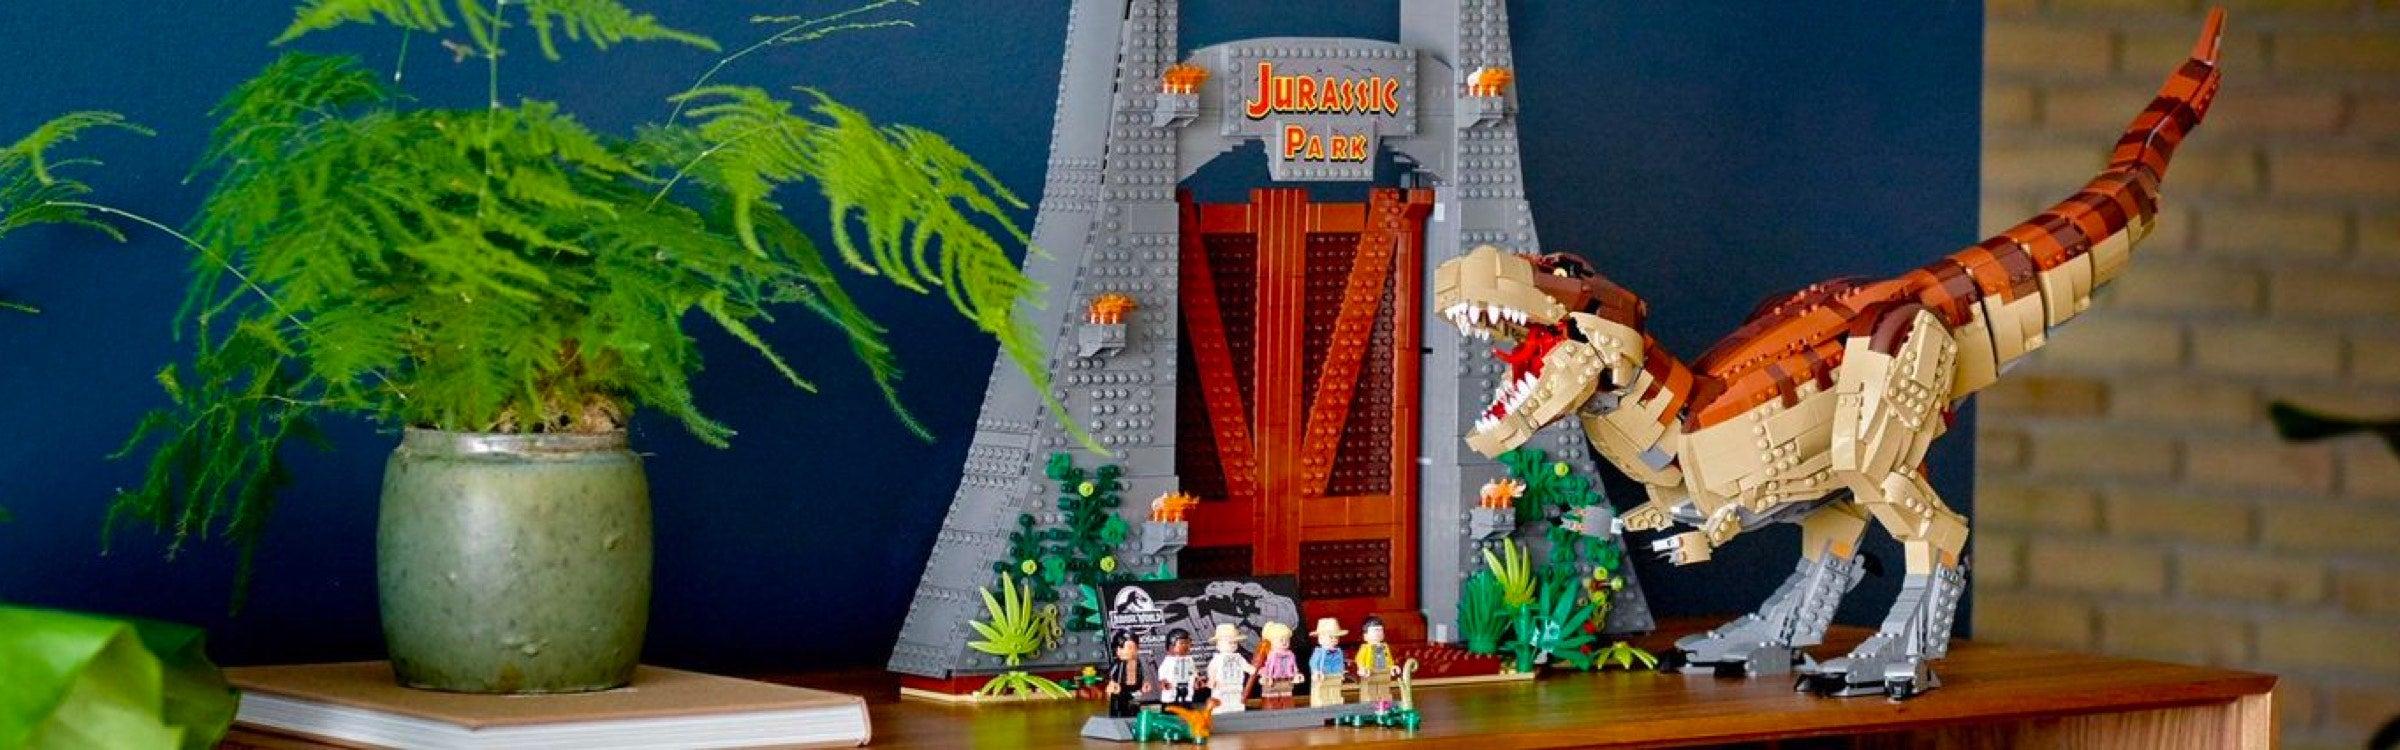 Jurassic World Minifigures T-Rex Crocodile Animal Dinosaurs Building Block Toys